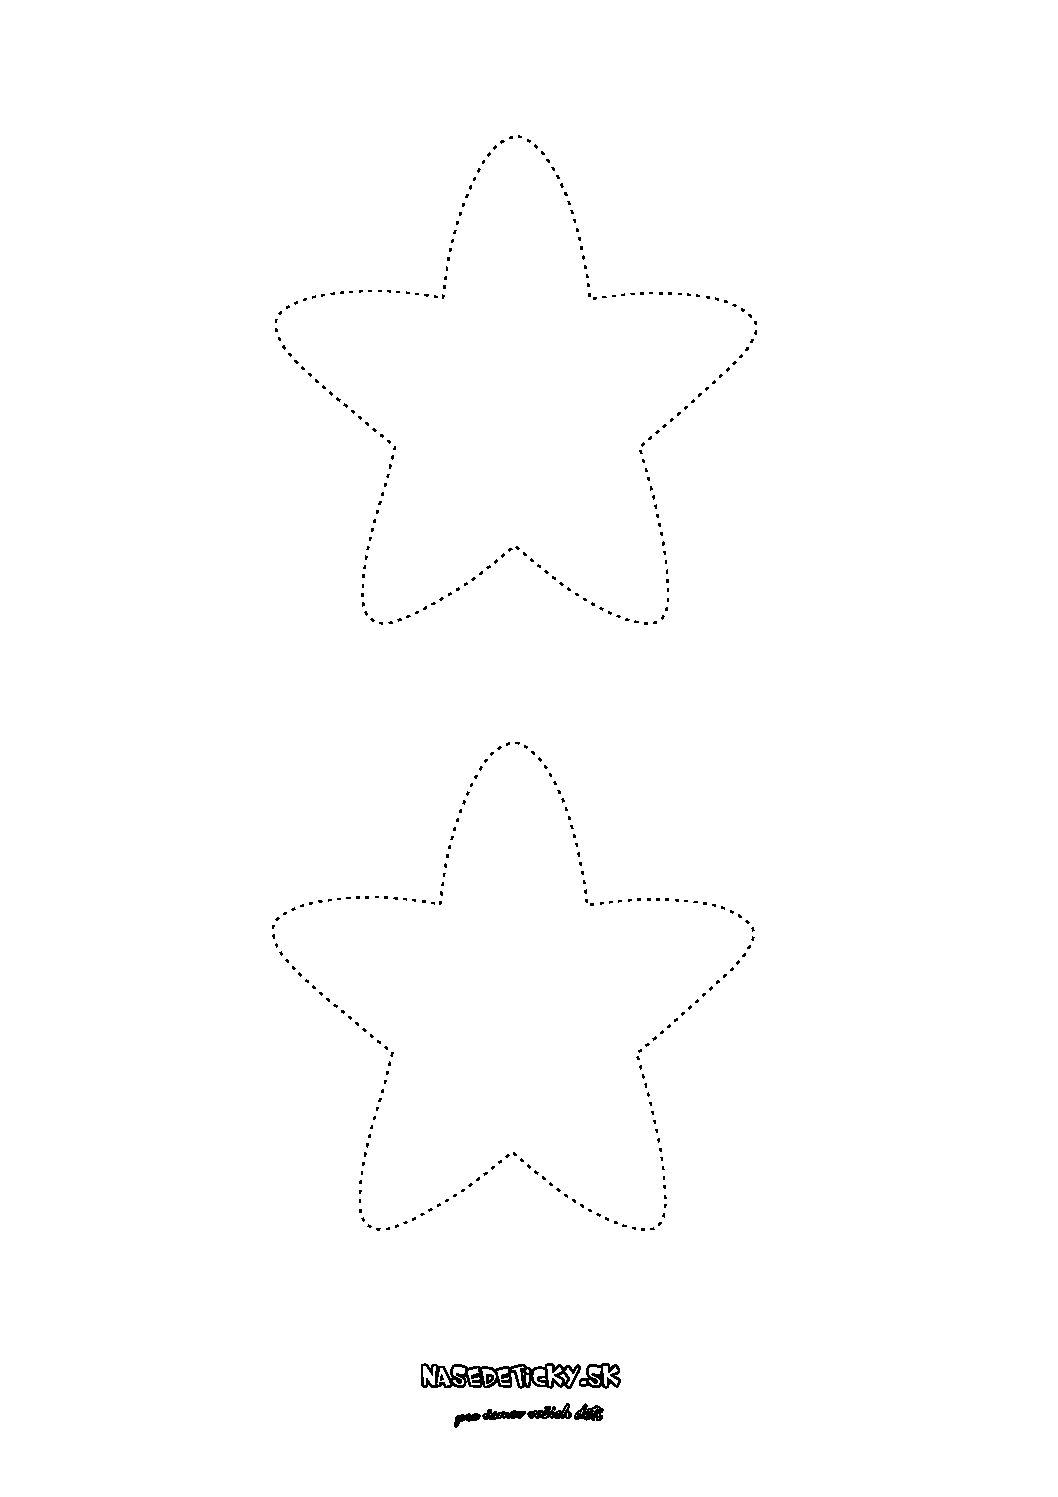 Hviezda - predloha, maketa - Vianoce